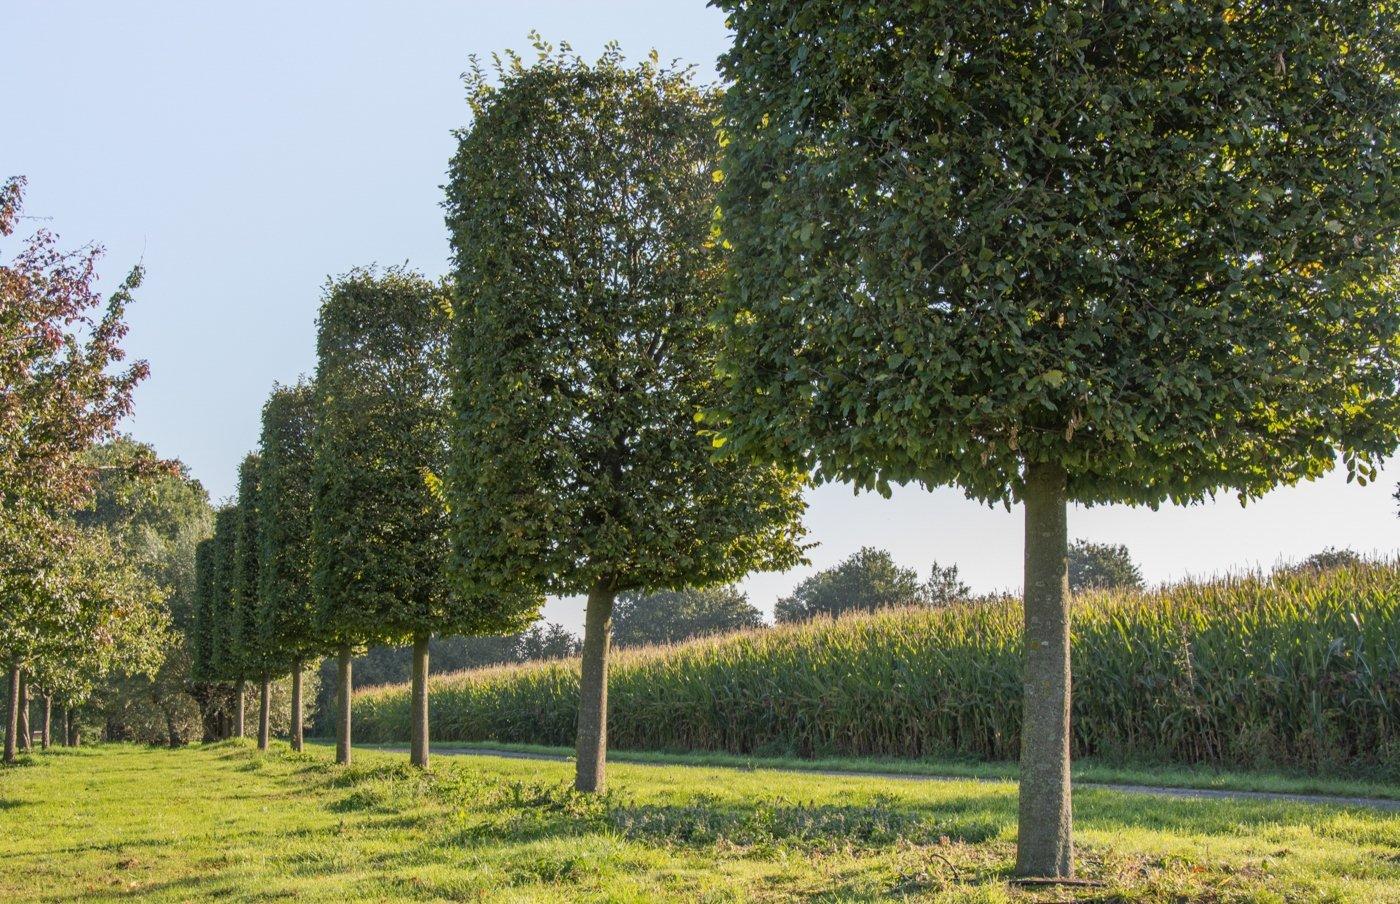 Carpinus betulus blok op stam